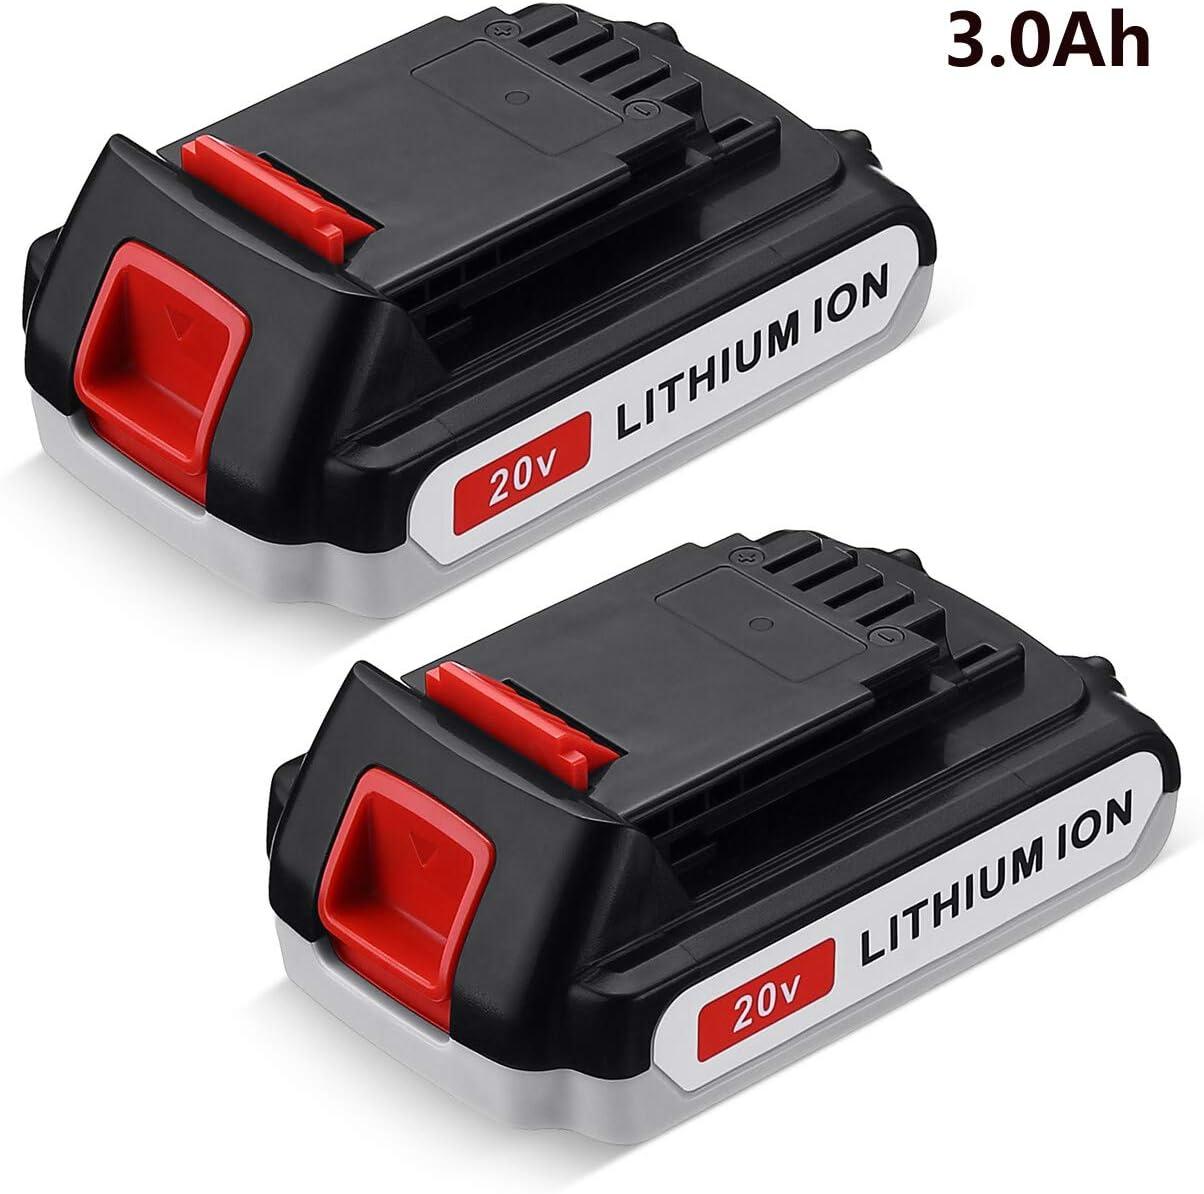 FirstPower LBXR20 3000mAh Replace for Black+Decker 20V MAX Lithium Battery LB20 LBX20 LST220 LBXR2020-OPE LBXR20B-2 LB2X4020 Cordless Tool Battery Extended Run Time 2-Packs